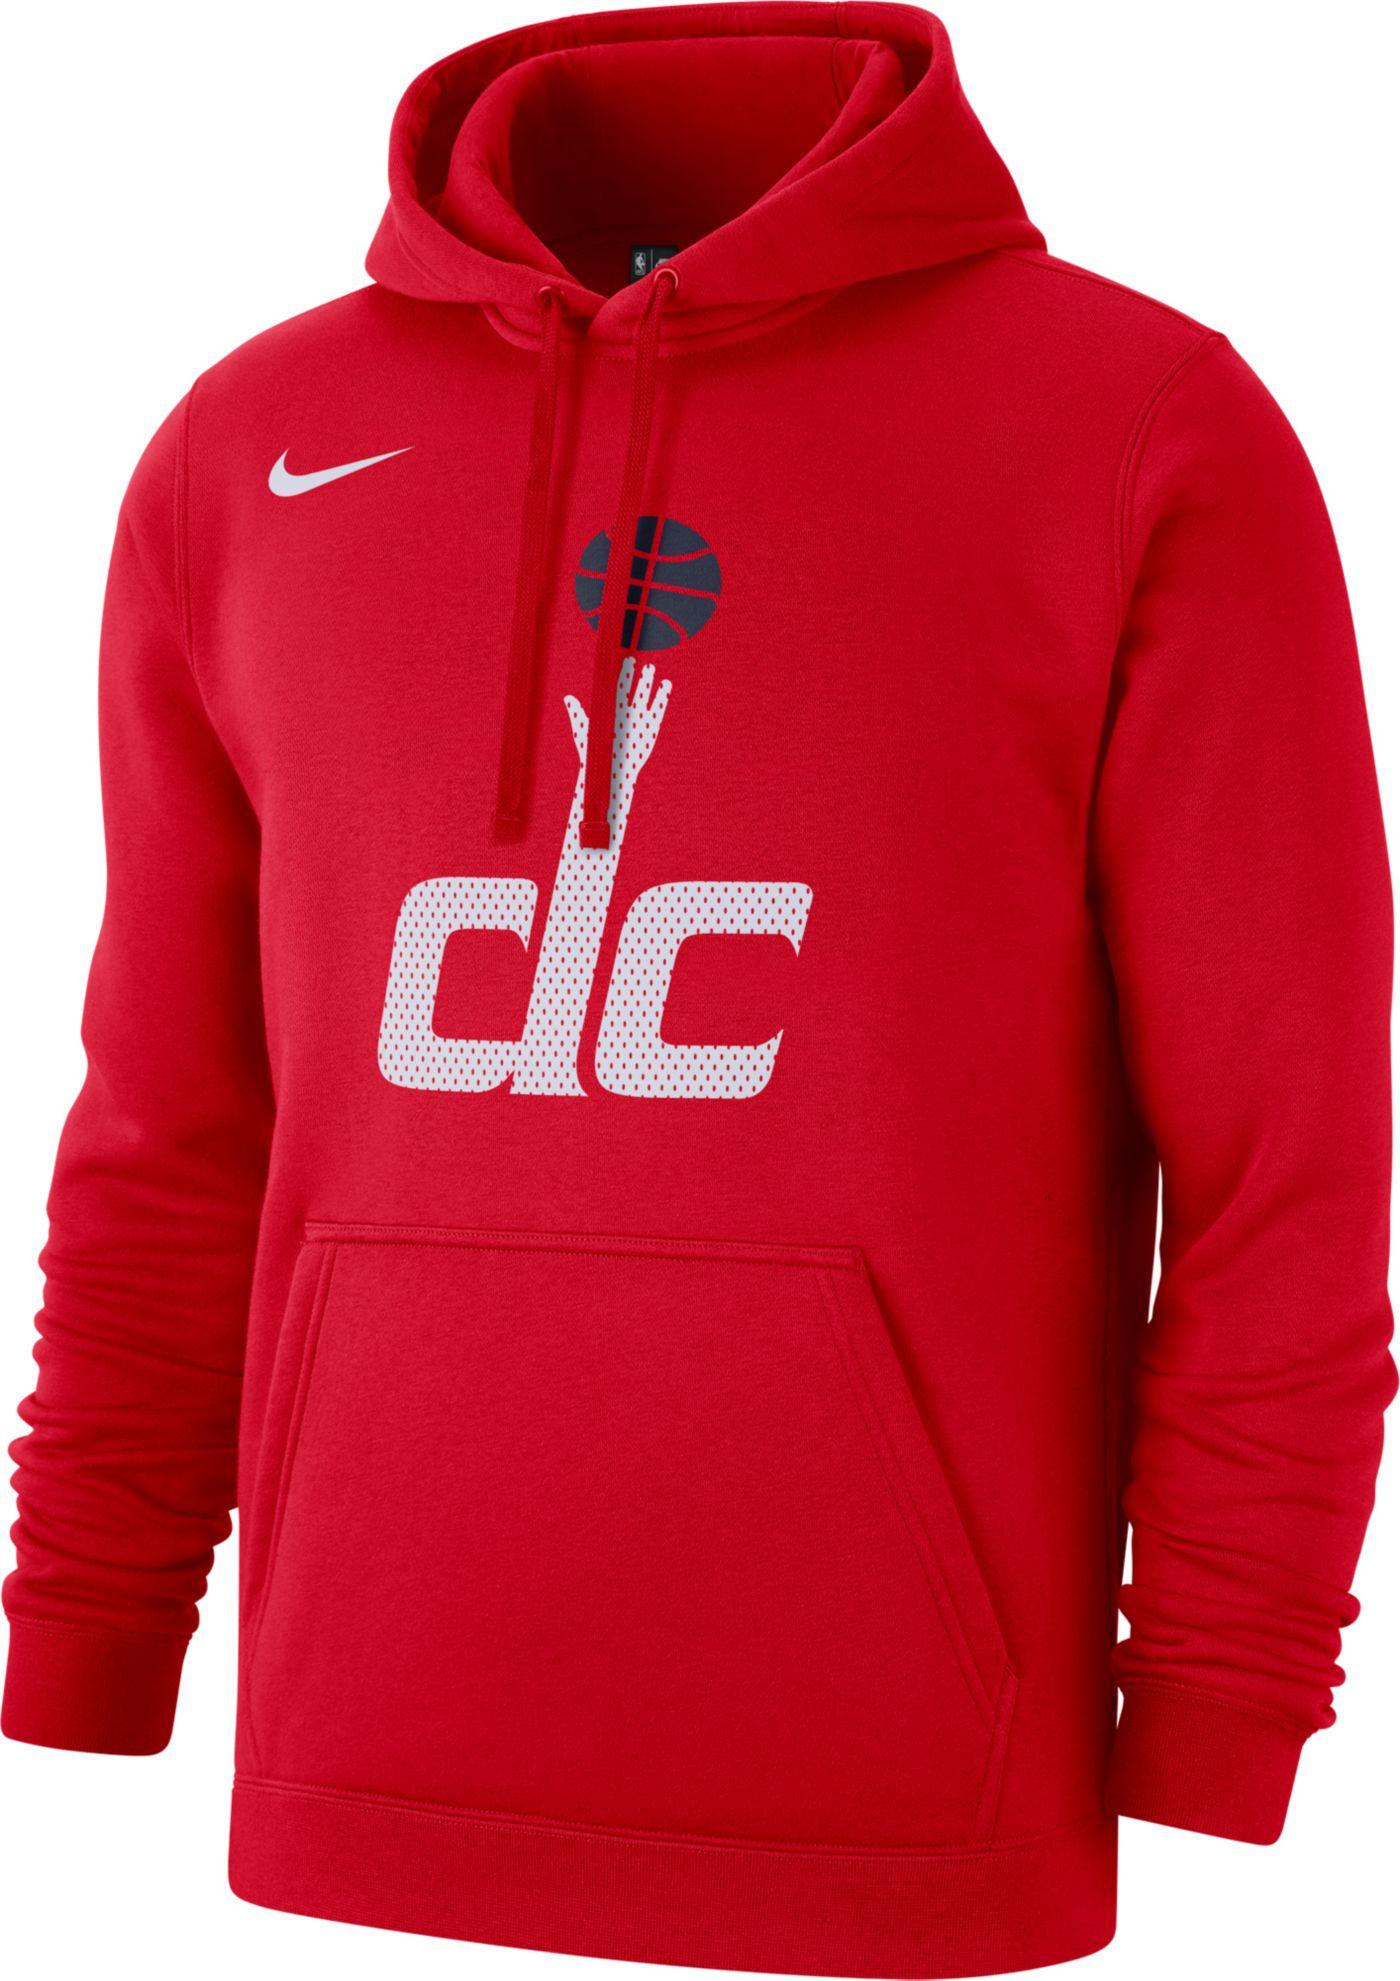 Nike Men's Washington Wizards Pullover Hoodie